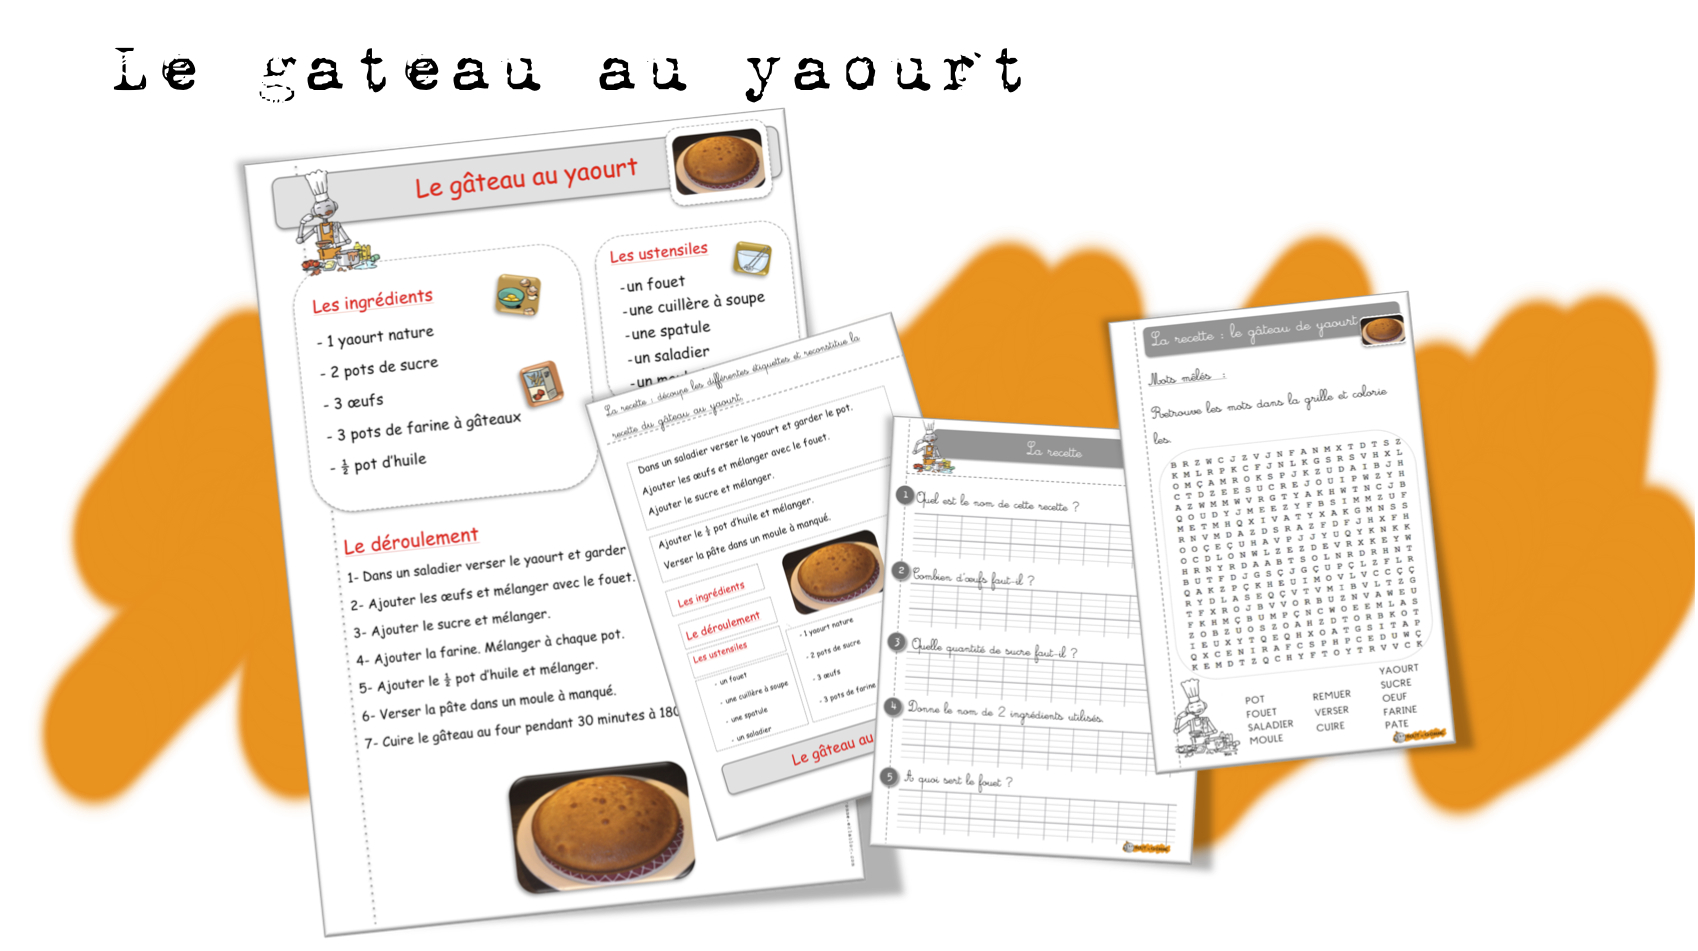 Recette gateau au yaourt illustree